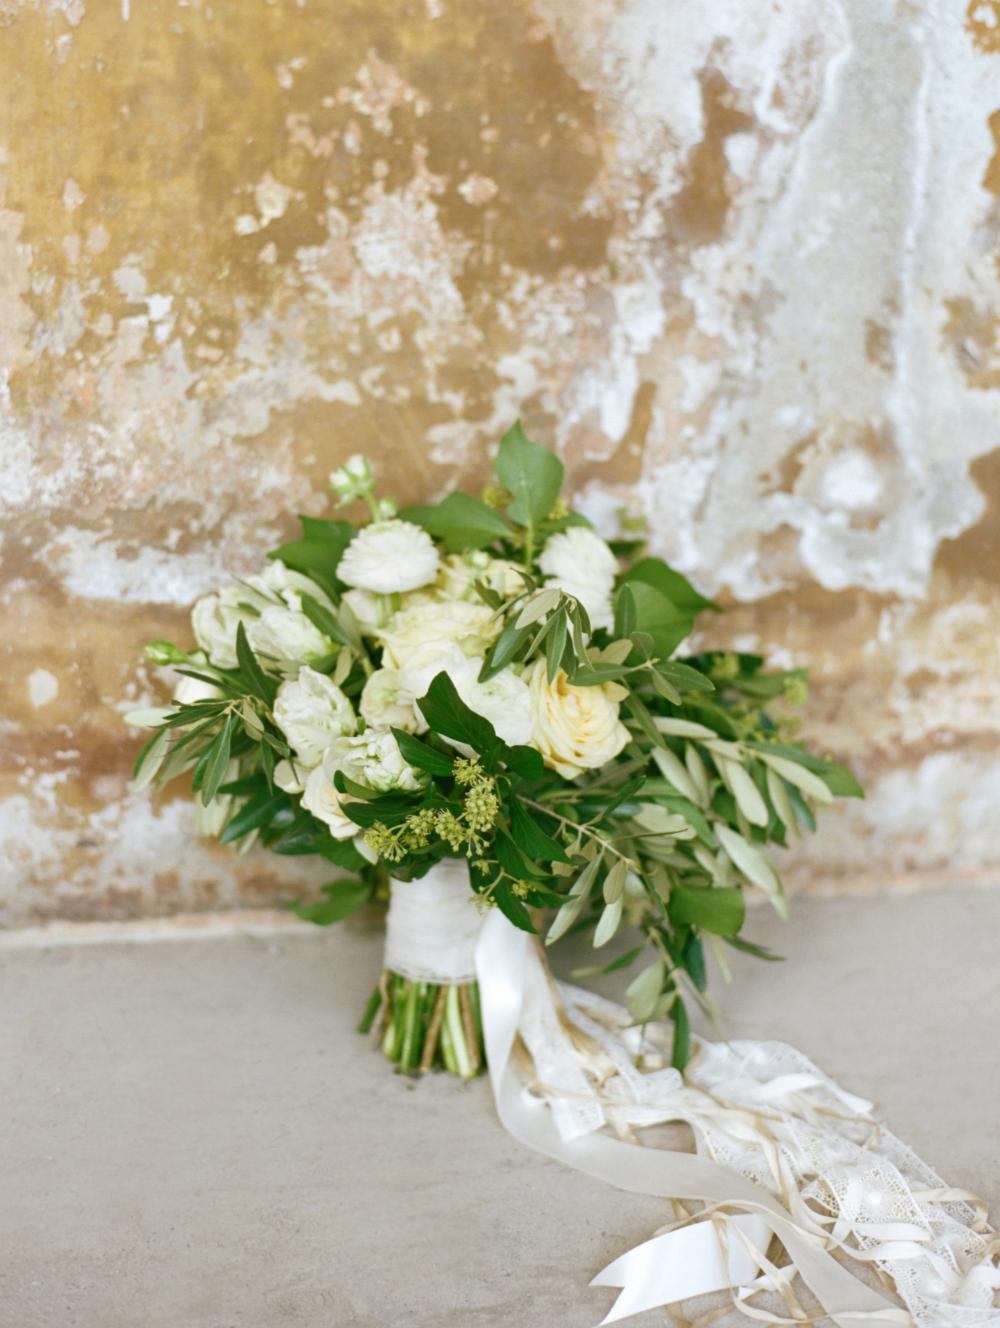 Chrissy Teigen John Legend Lake Como Wedding Lisa Vorce Co Image Gallery Lisa Vorce Chrissy Teigen Wedding Wedding Boquet Italian Wedding